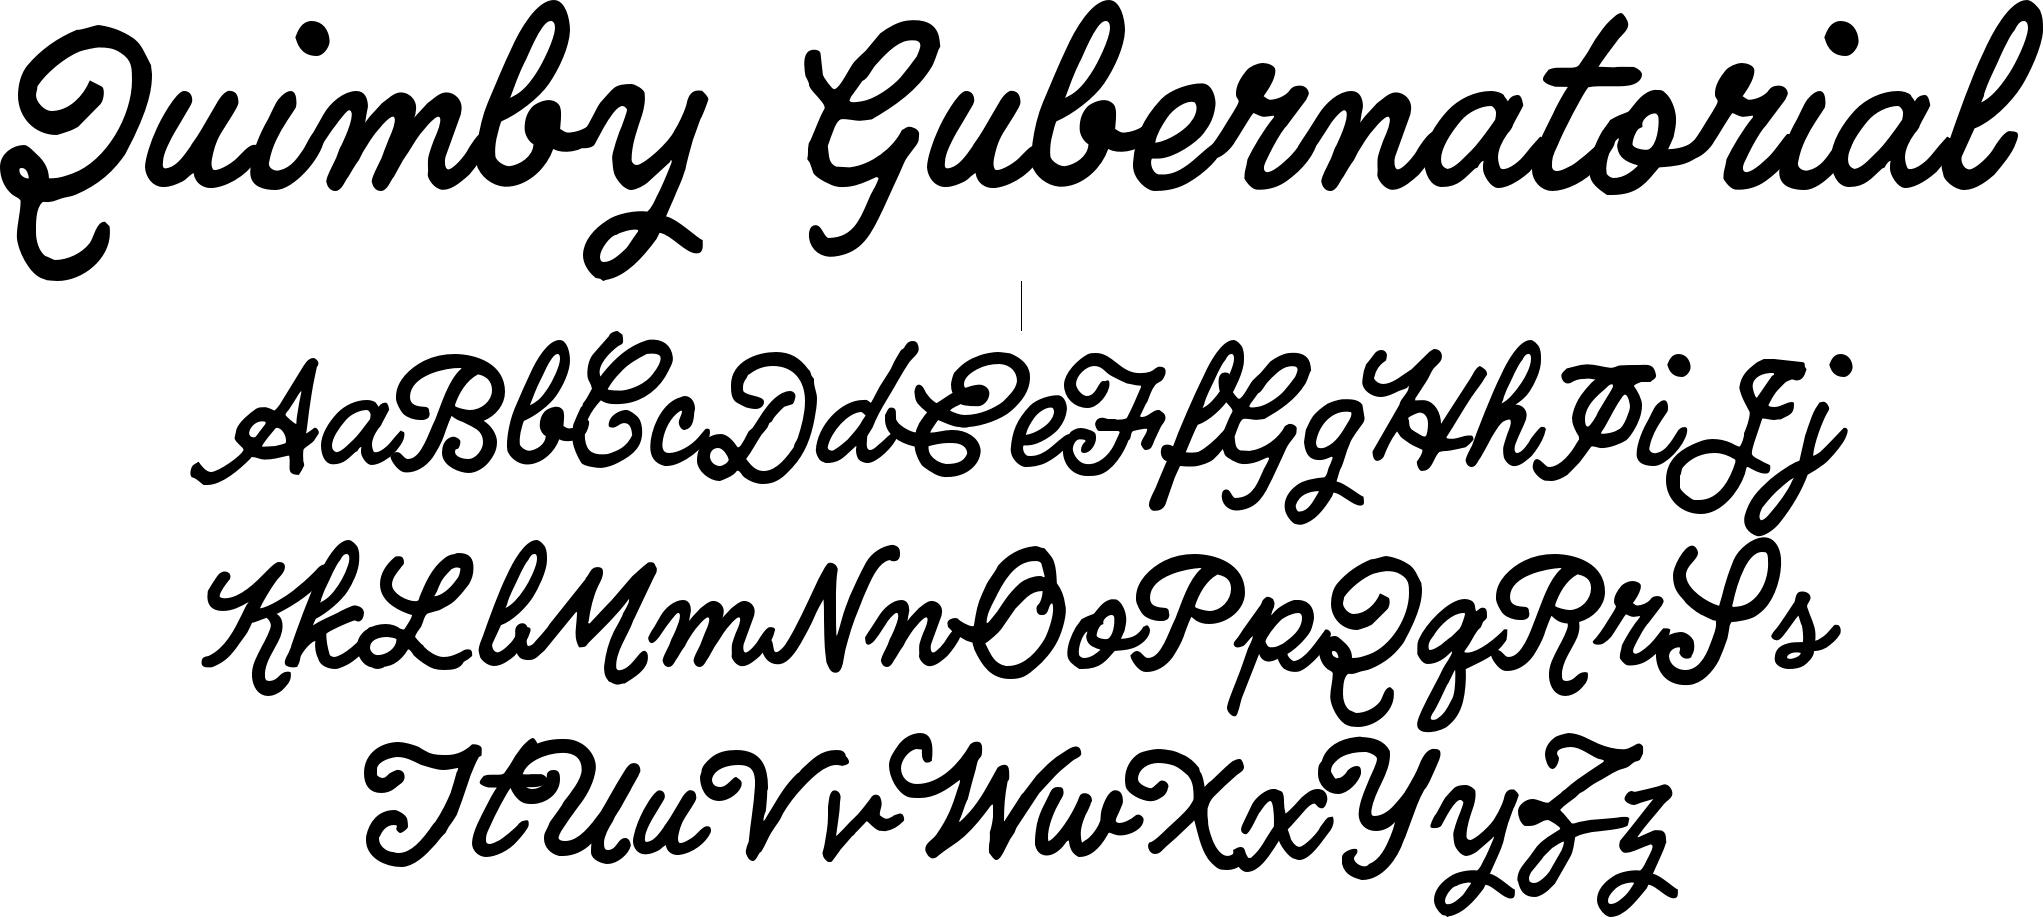 Quimby Gubernatorial